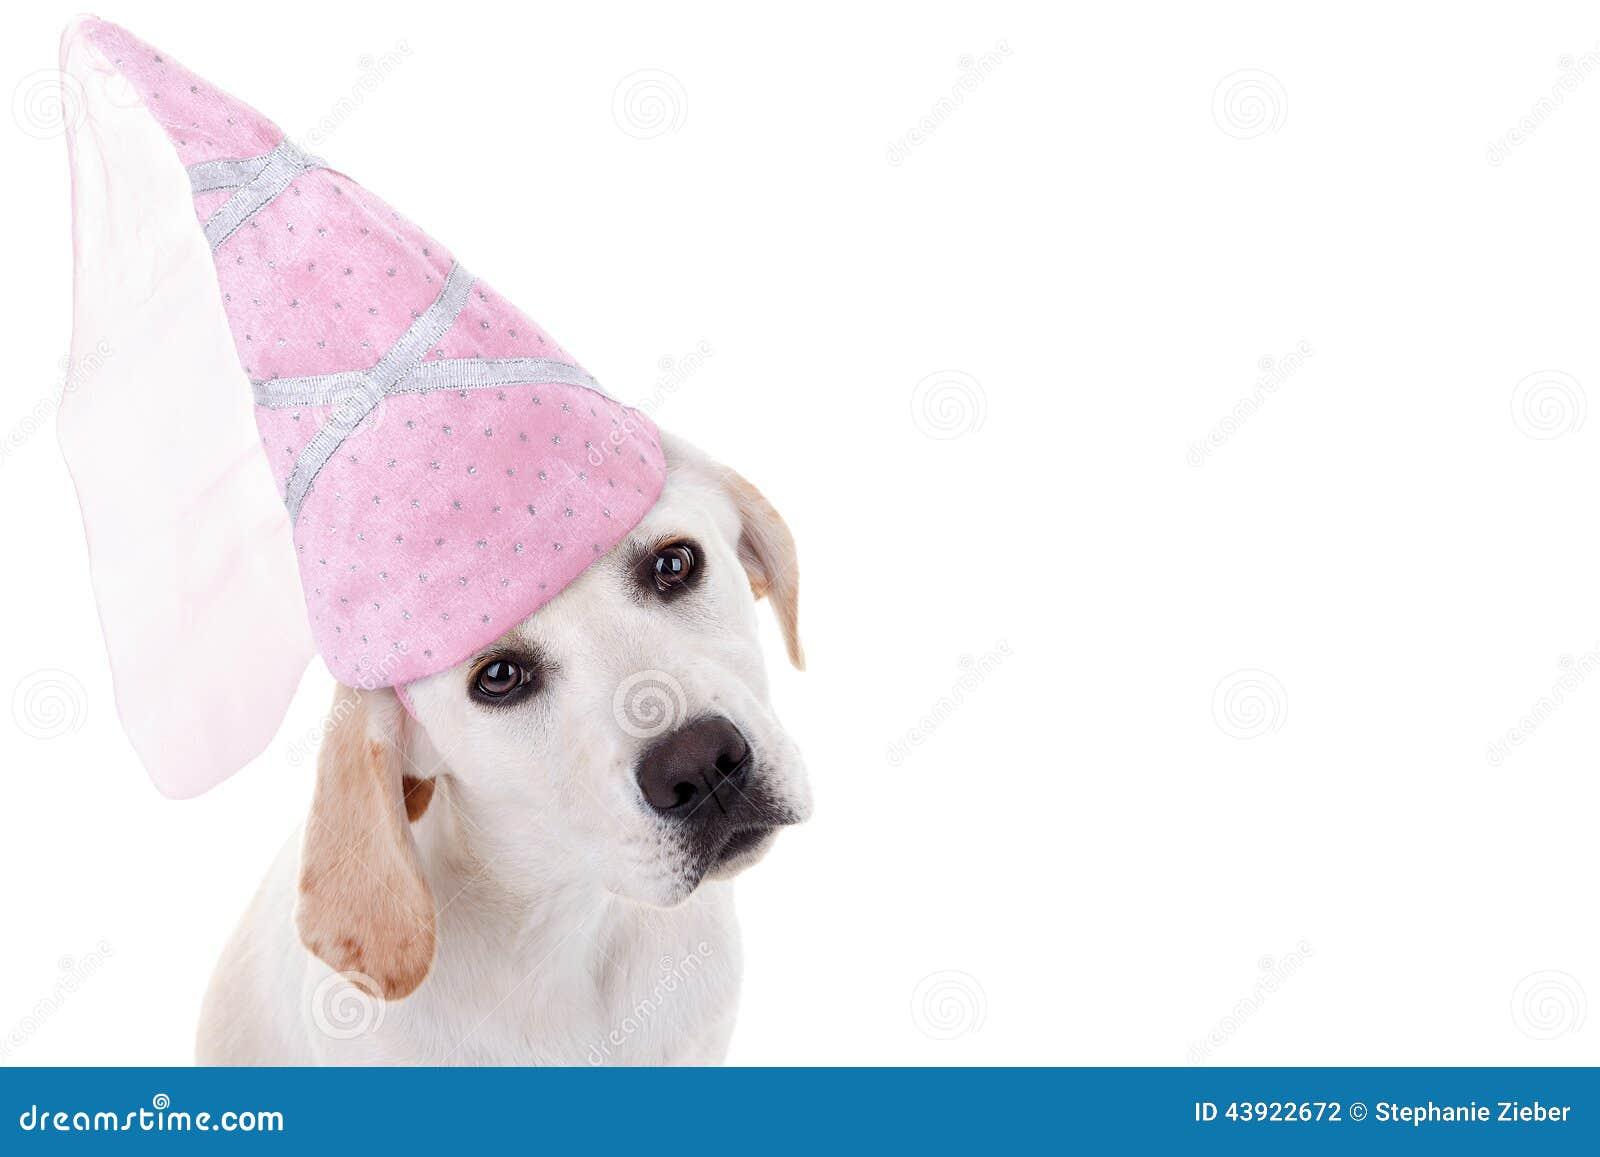 Download Dog Princess stock photo. Image of ballerina girl costume - 43922672  sc 1 st  Dreamstime.com & Dog Princess stock photo. Image of ballerina girl costume - 43922672